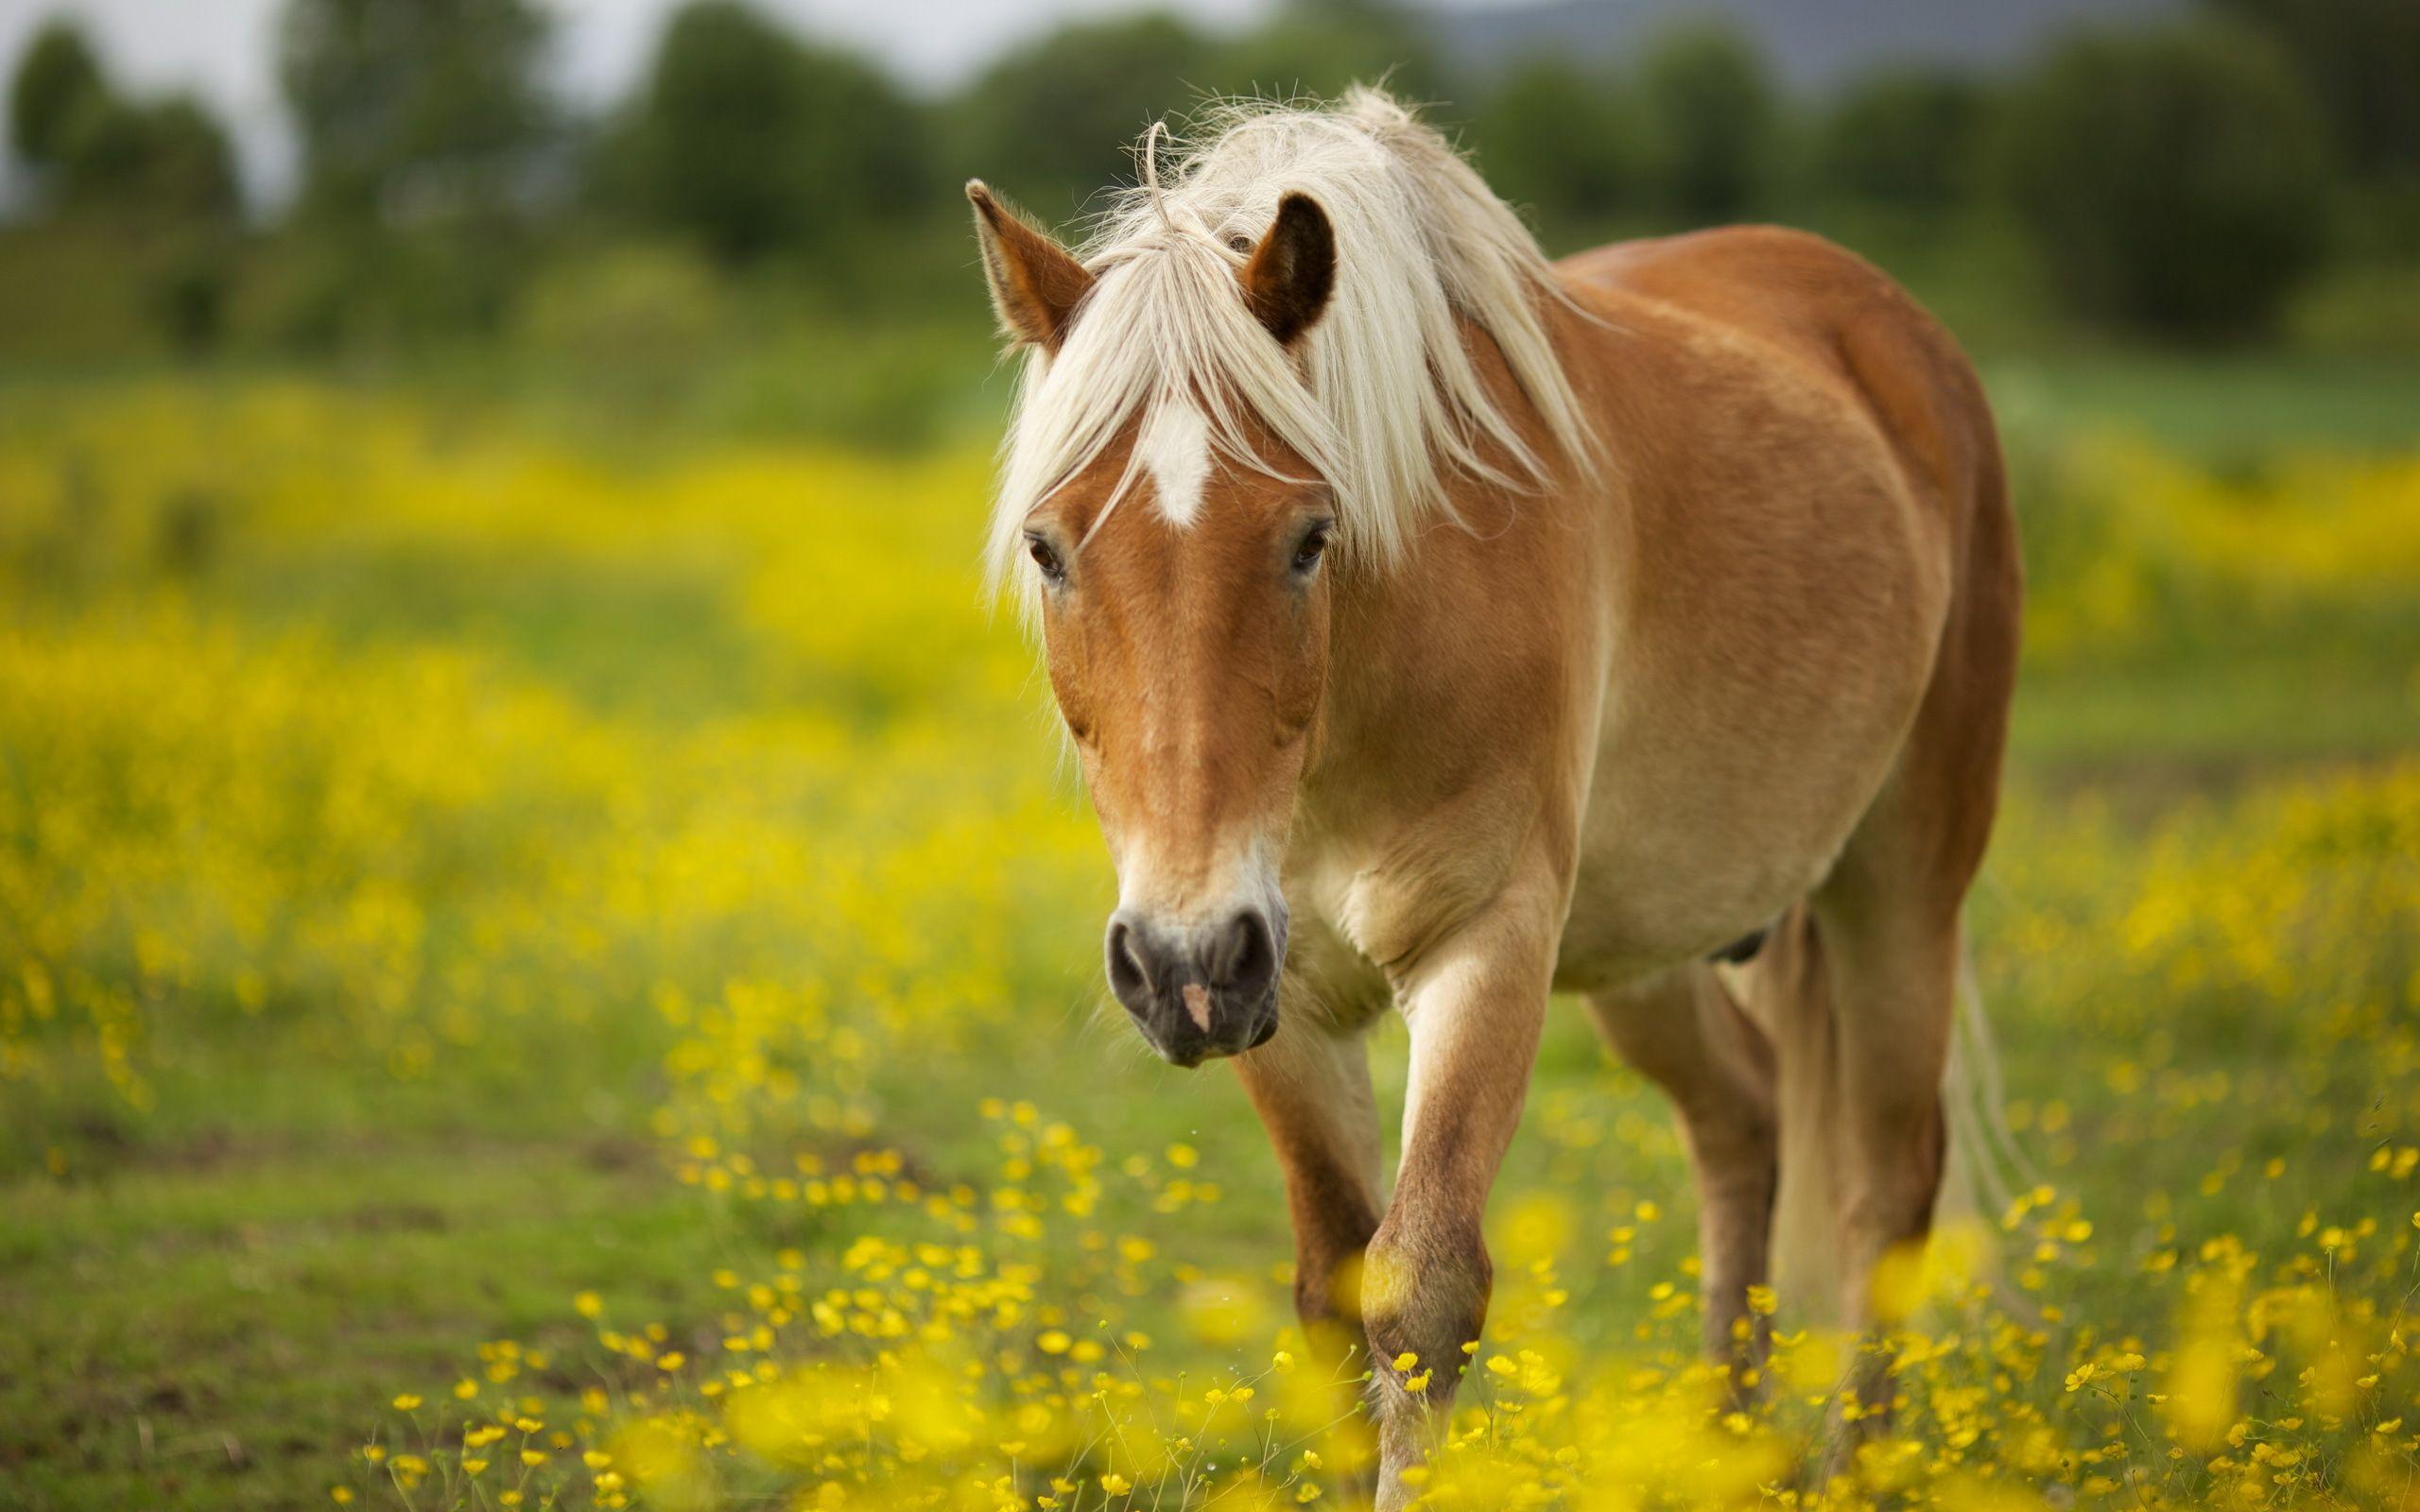 Beautiful Wallpaper Horse Yellow - d9e206300a20372cb49bd4f691b3f8bb  Graphic_644964.jpg